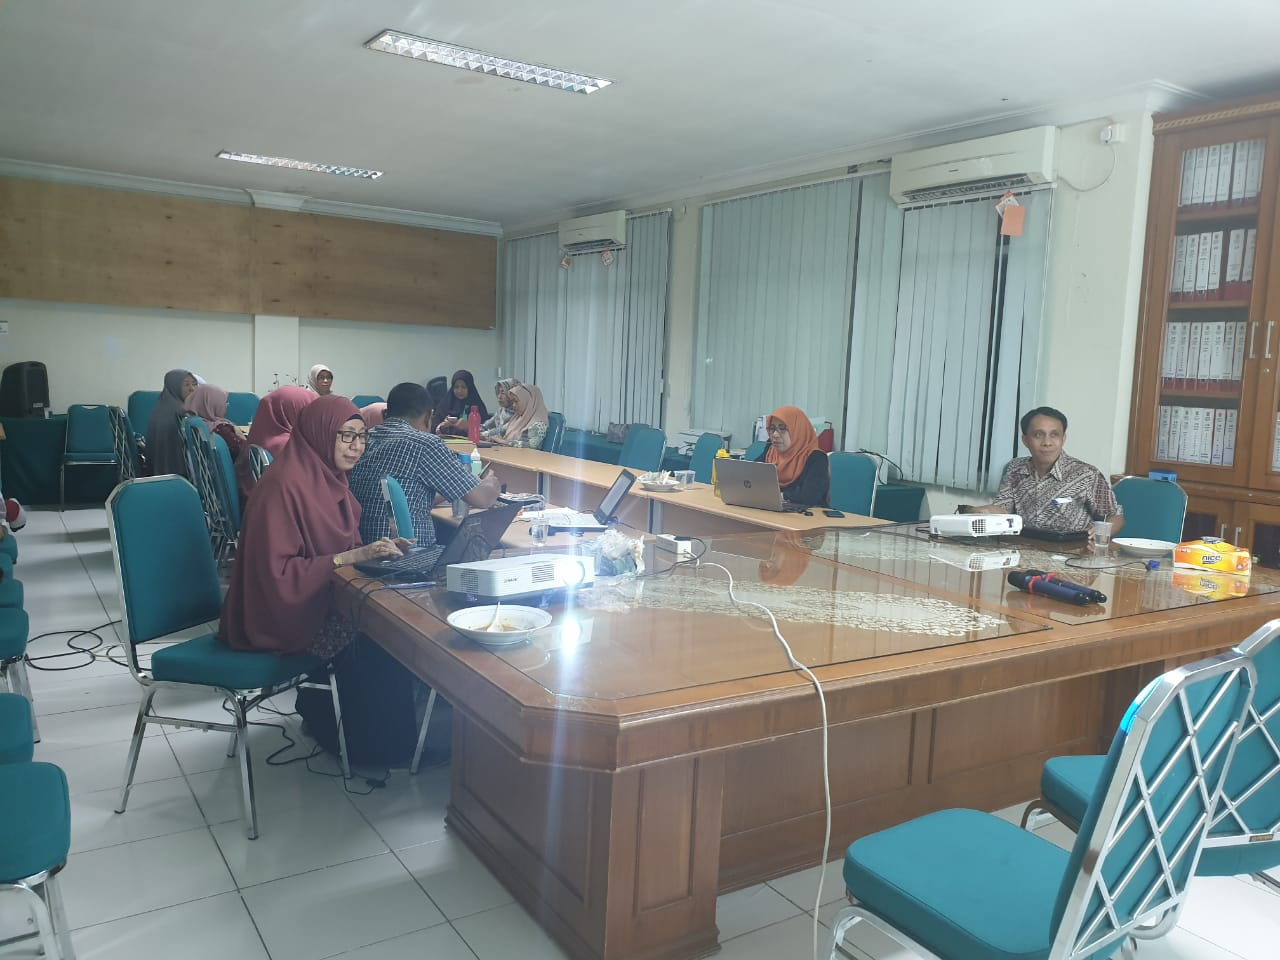 Diskusi hangat jelang submit AIPT Unidha